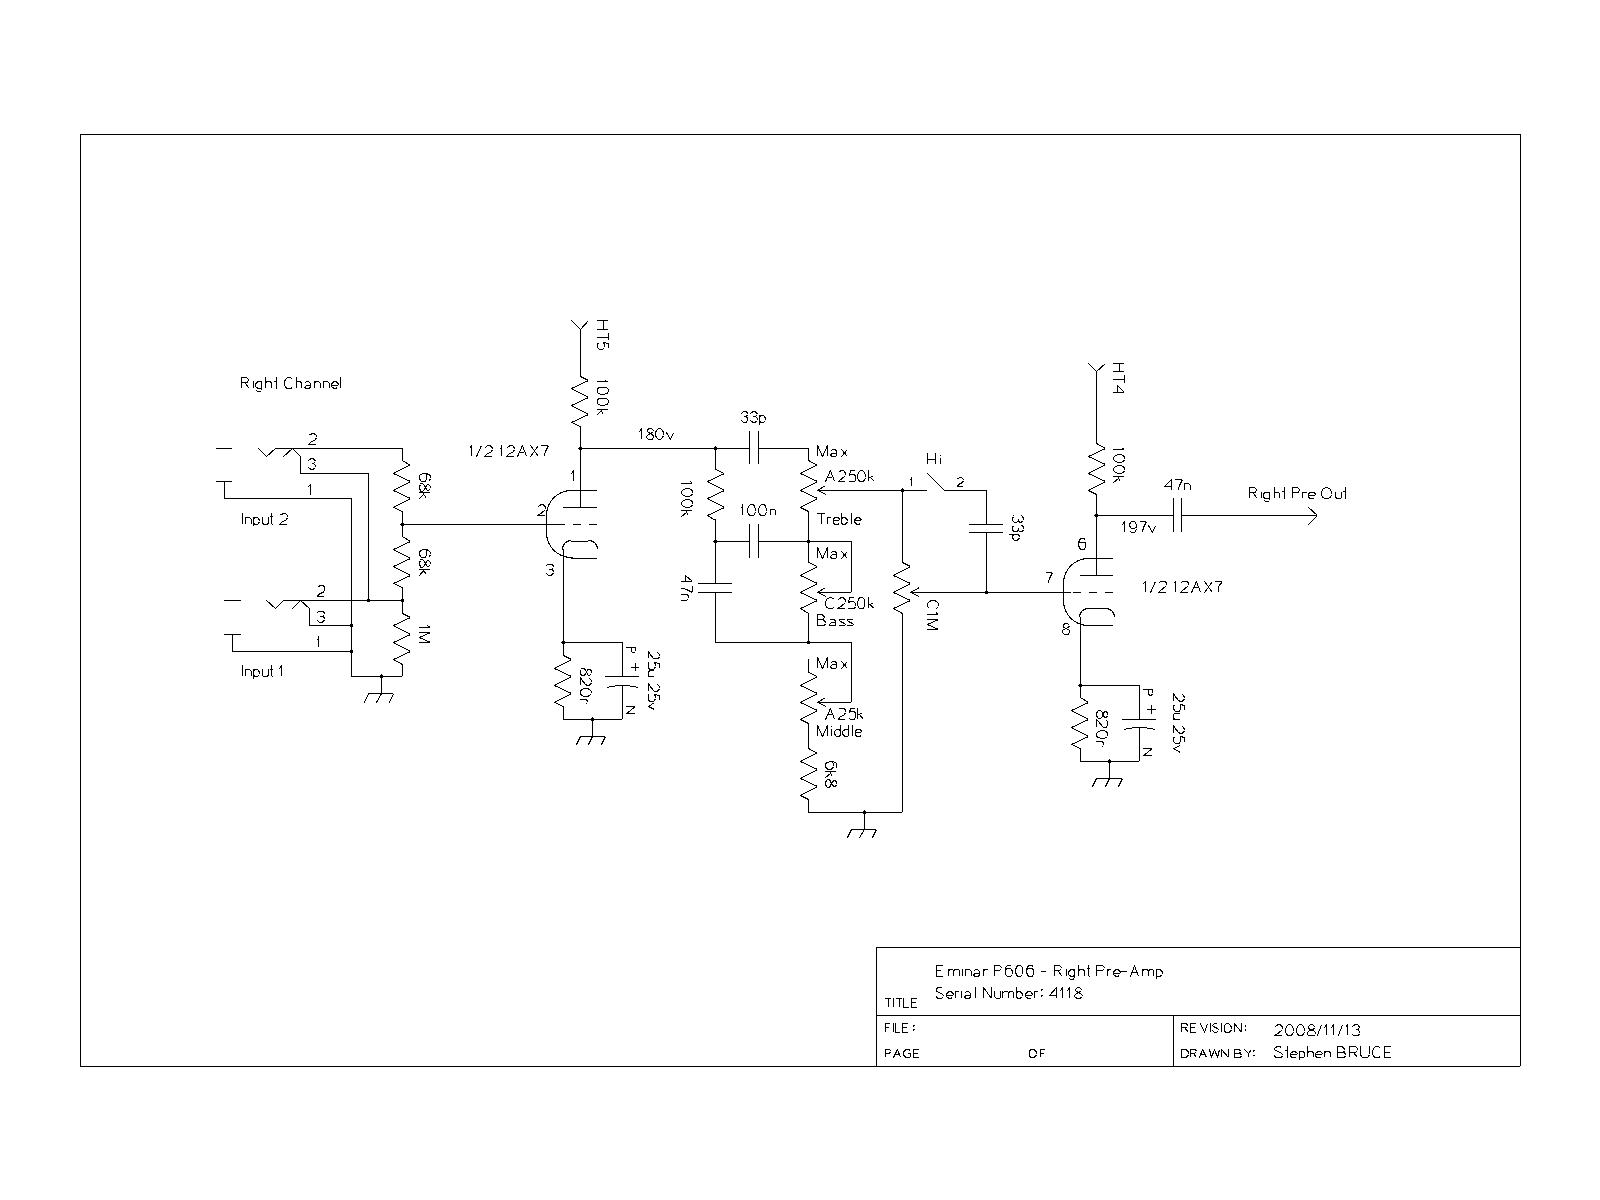 Eminar Jbl Speaker Parts Diagram Free Download Wiring Diagrams Pictures Preamp Right Circuit